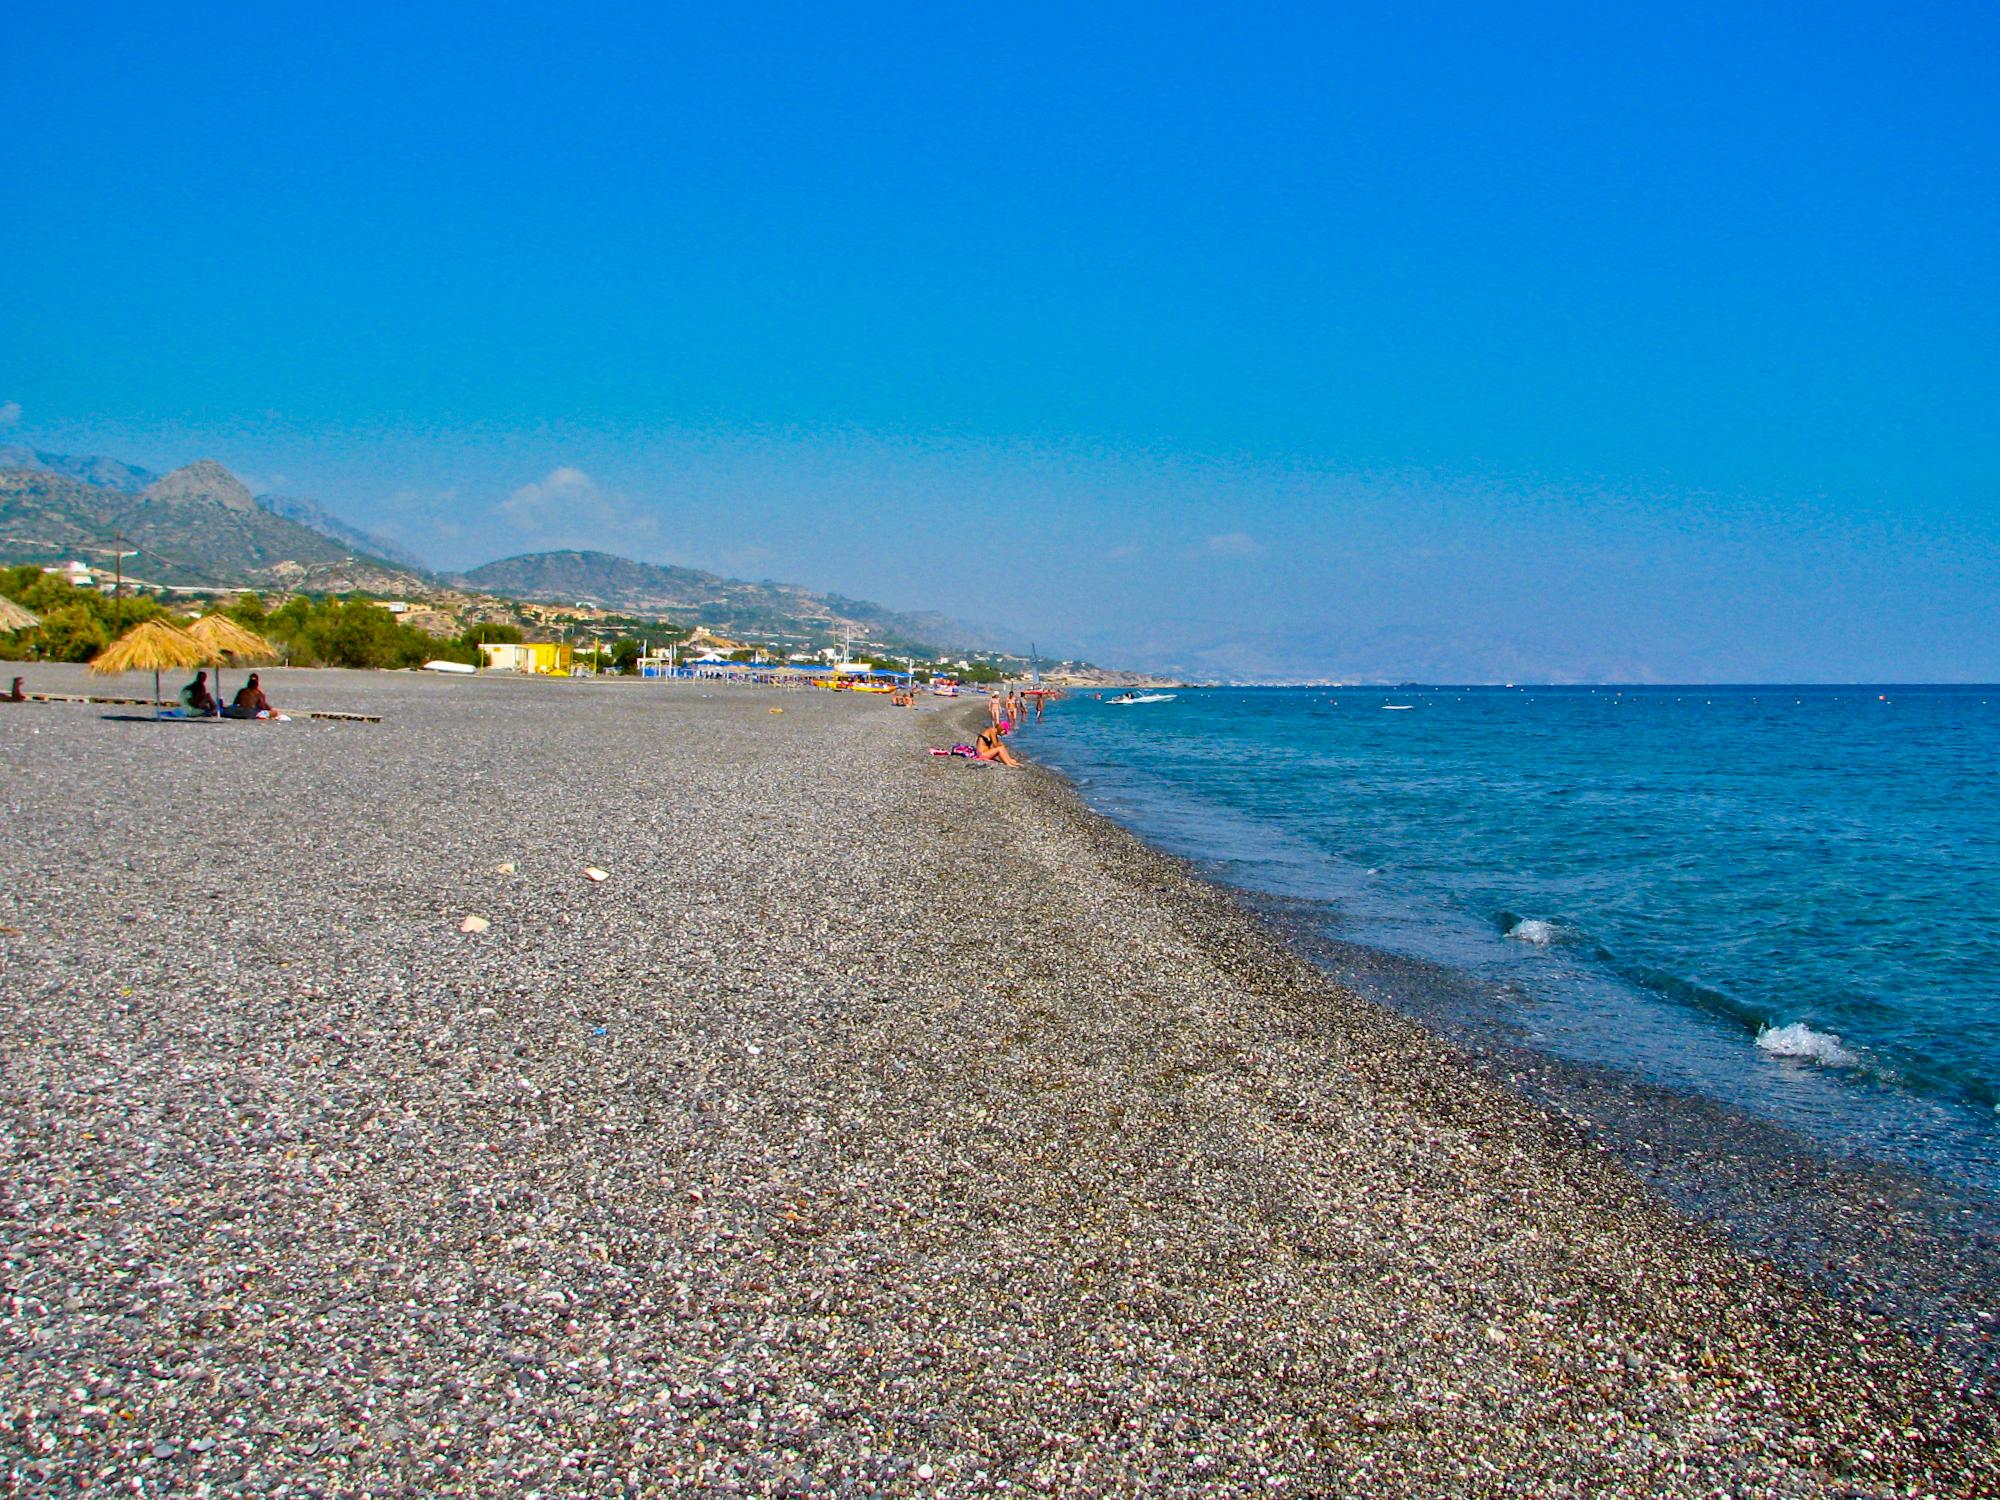 Creta Beach Hotel And Bungalows